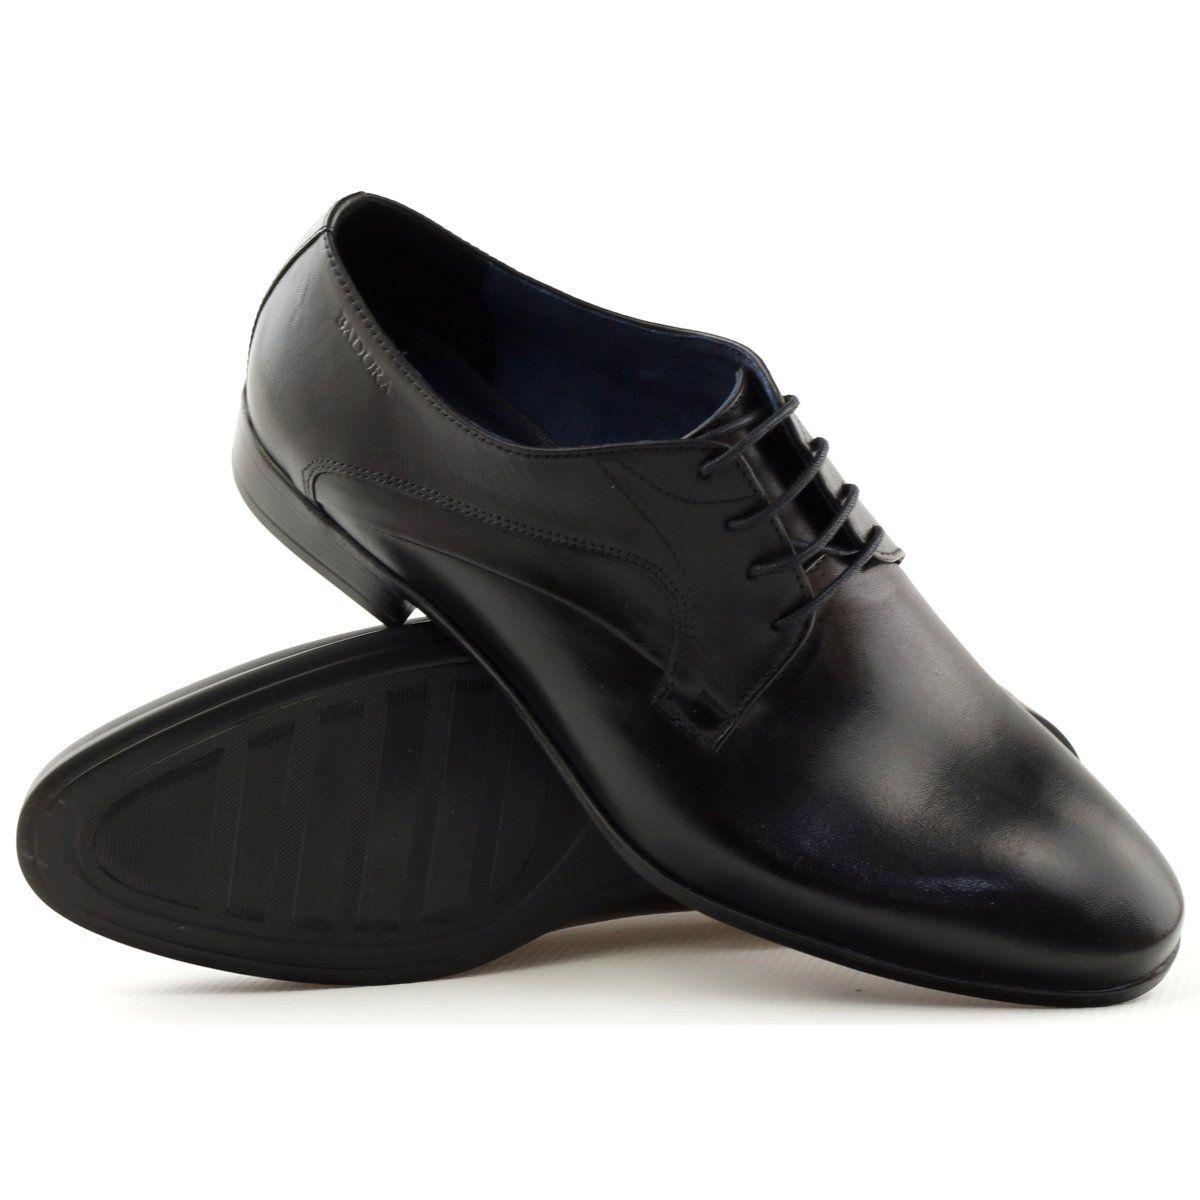 Polbuty Pantofle Badura 7589 Czarne Dress Shoes Men Oxford Shoes Dress Shoes